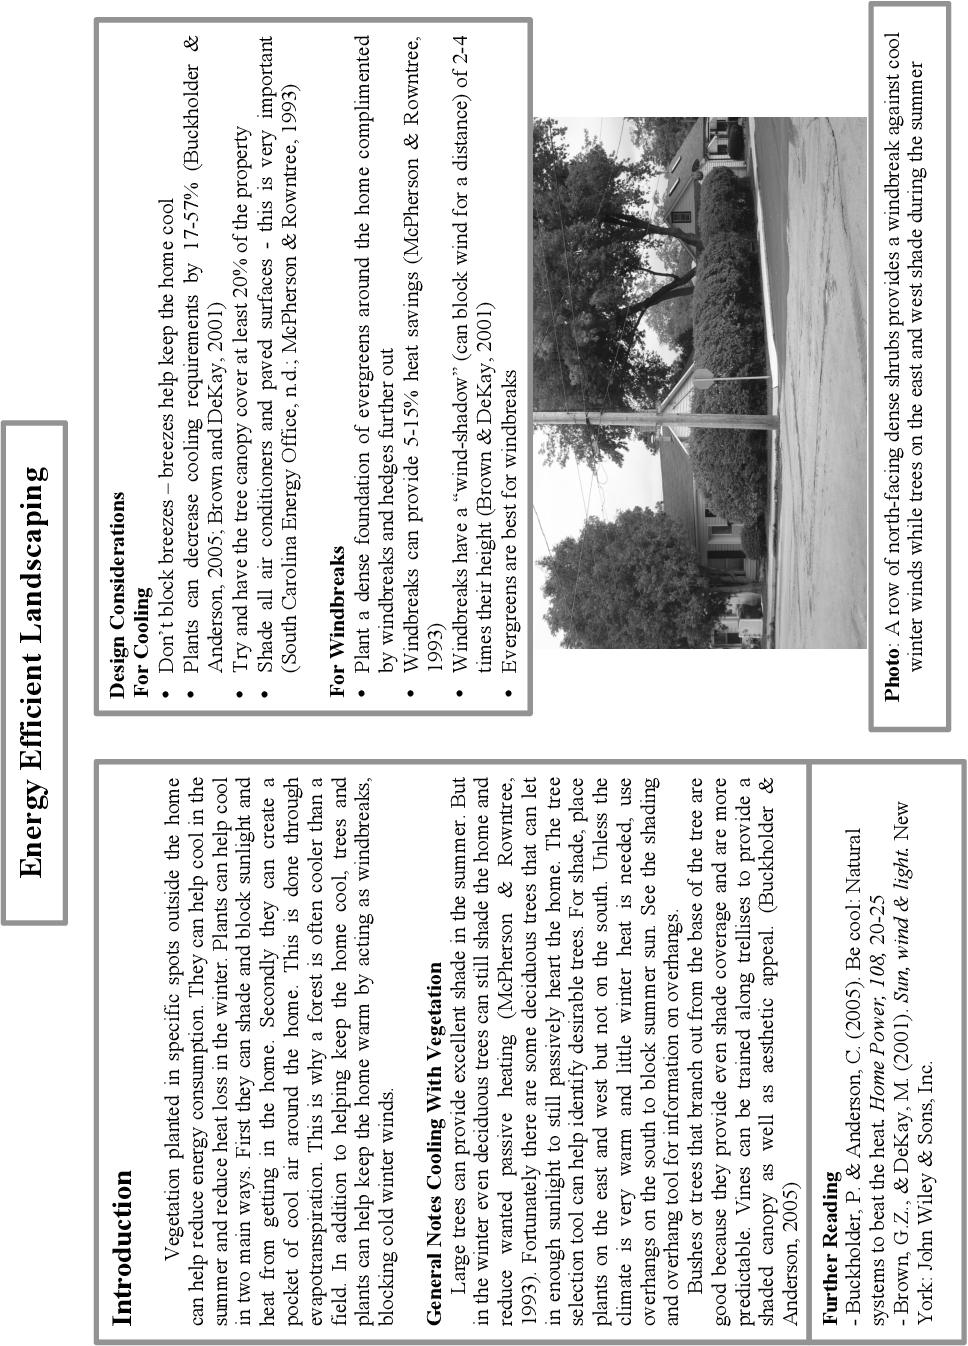 PDF] RETROFITTING SUBURBAN HOMES FOR RESILIENCY: A PROTOTYPE